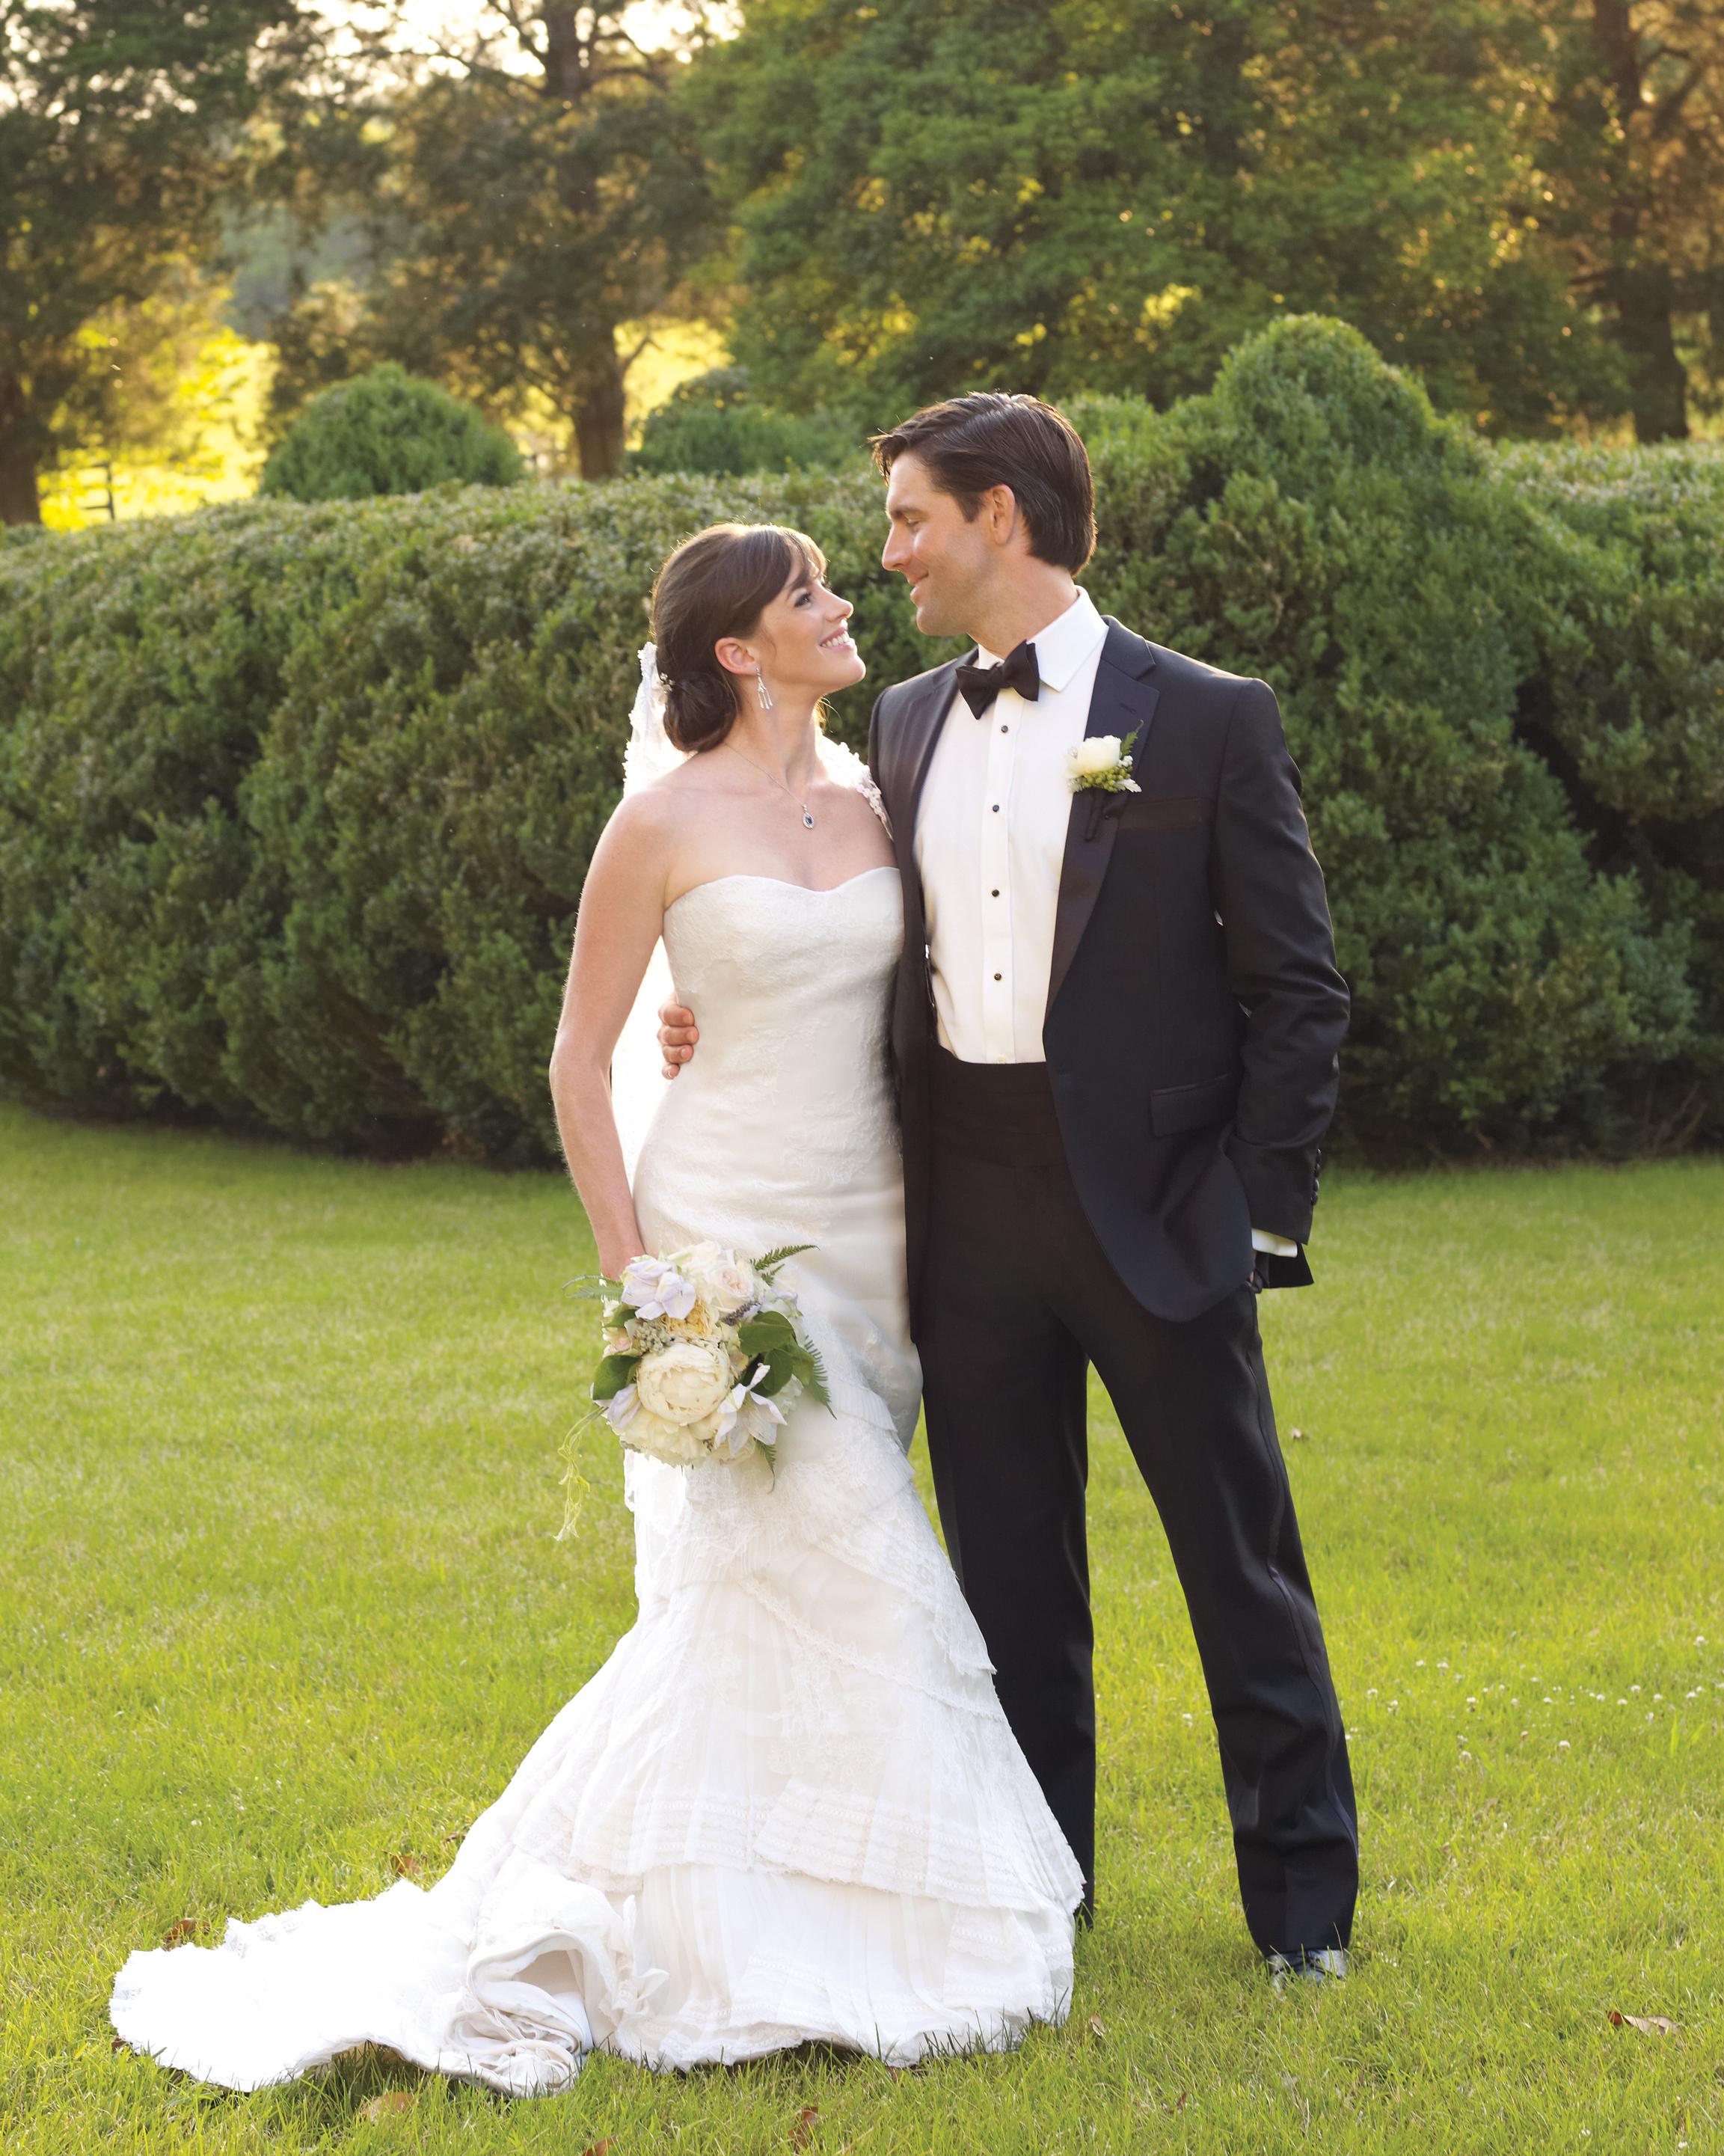 kennedy-gregory-husband-wife-029-mwd108943.jpg